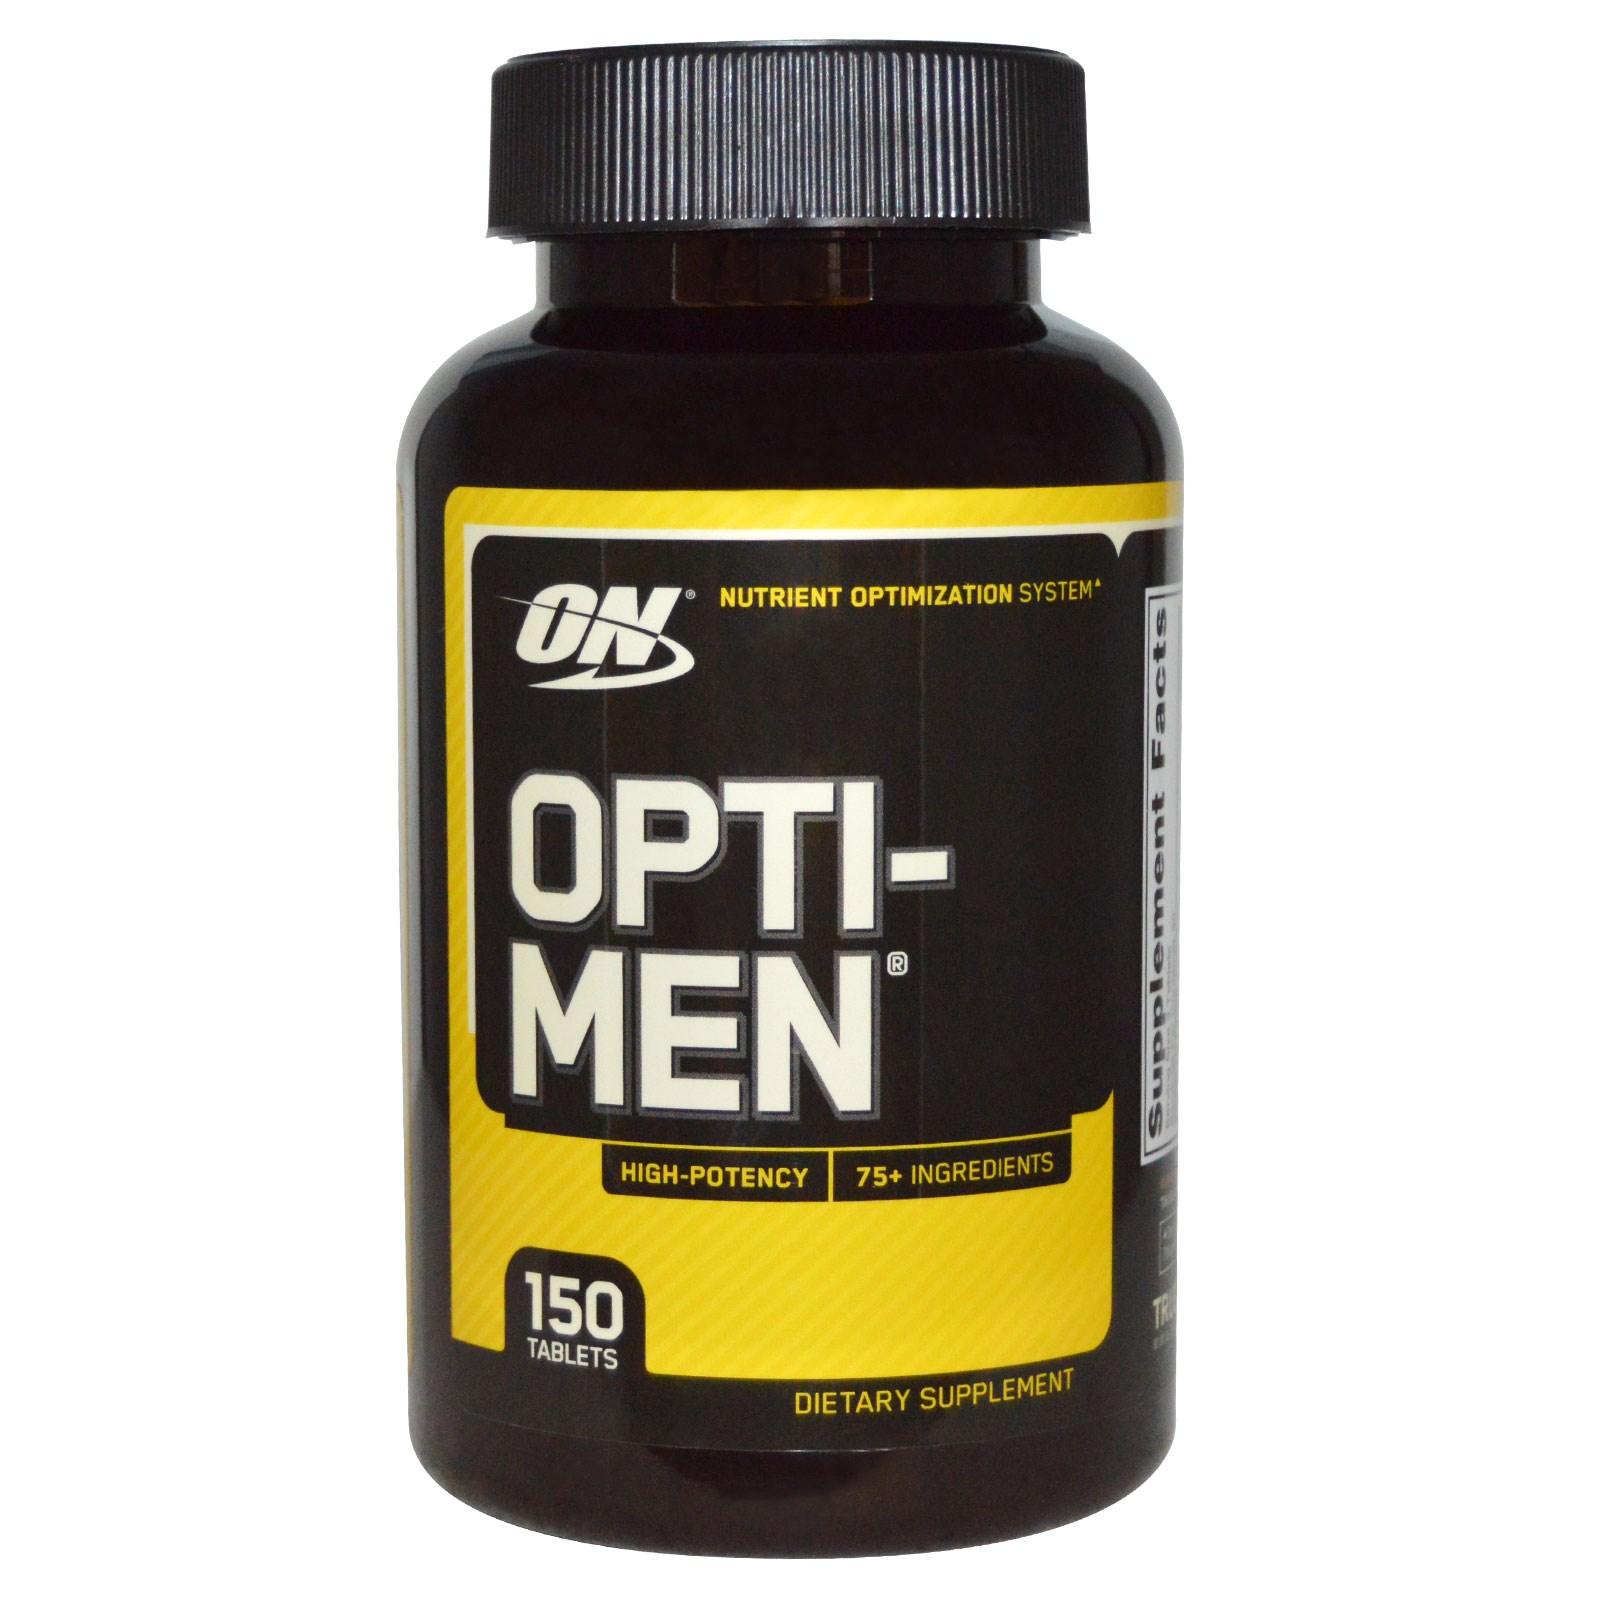 Opti-Men в таблетках (150 штук) от Optimum Nutrition.